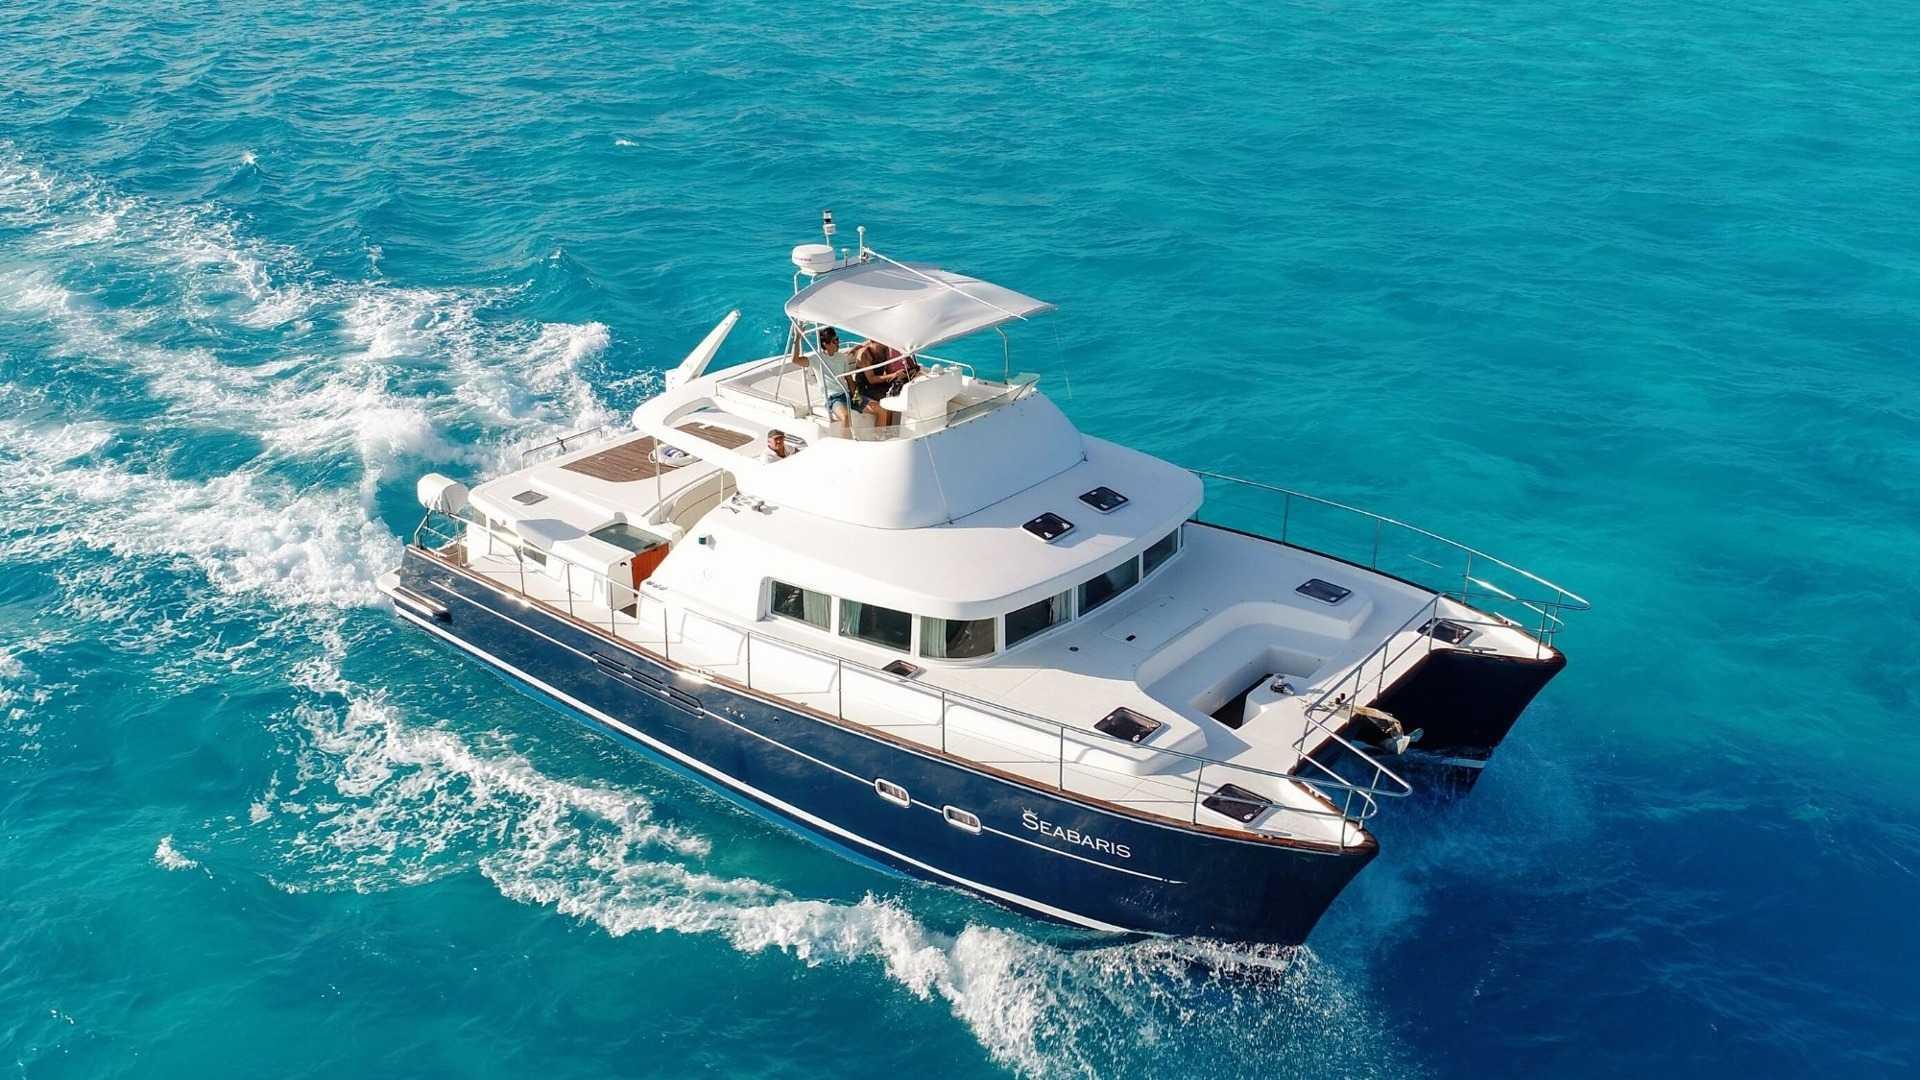 1 - LowRes - Private Isla Mujeres tour in catamaran - Seabaris - Cancun Sailing